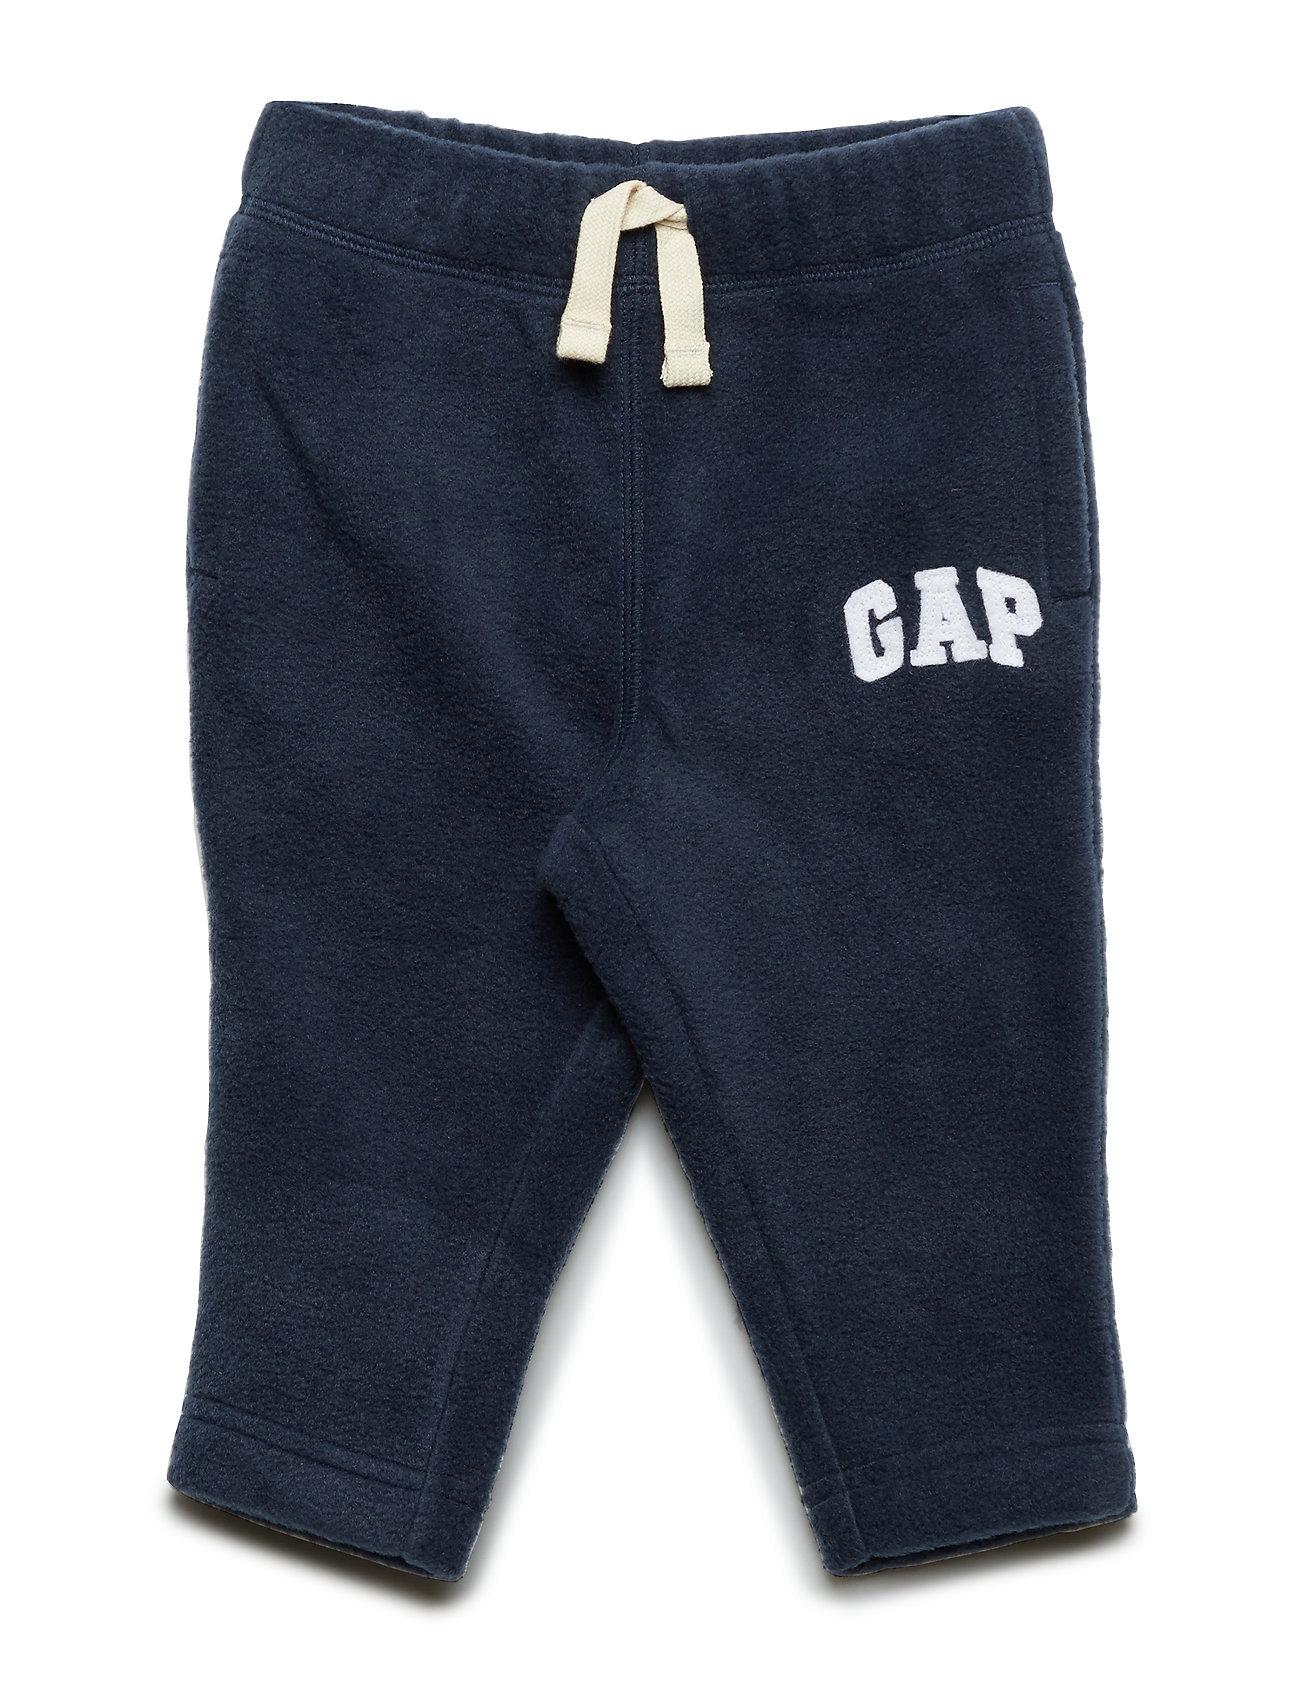 GAP PROFLC PANT - BLUE GALAXY